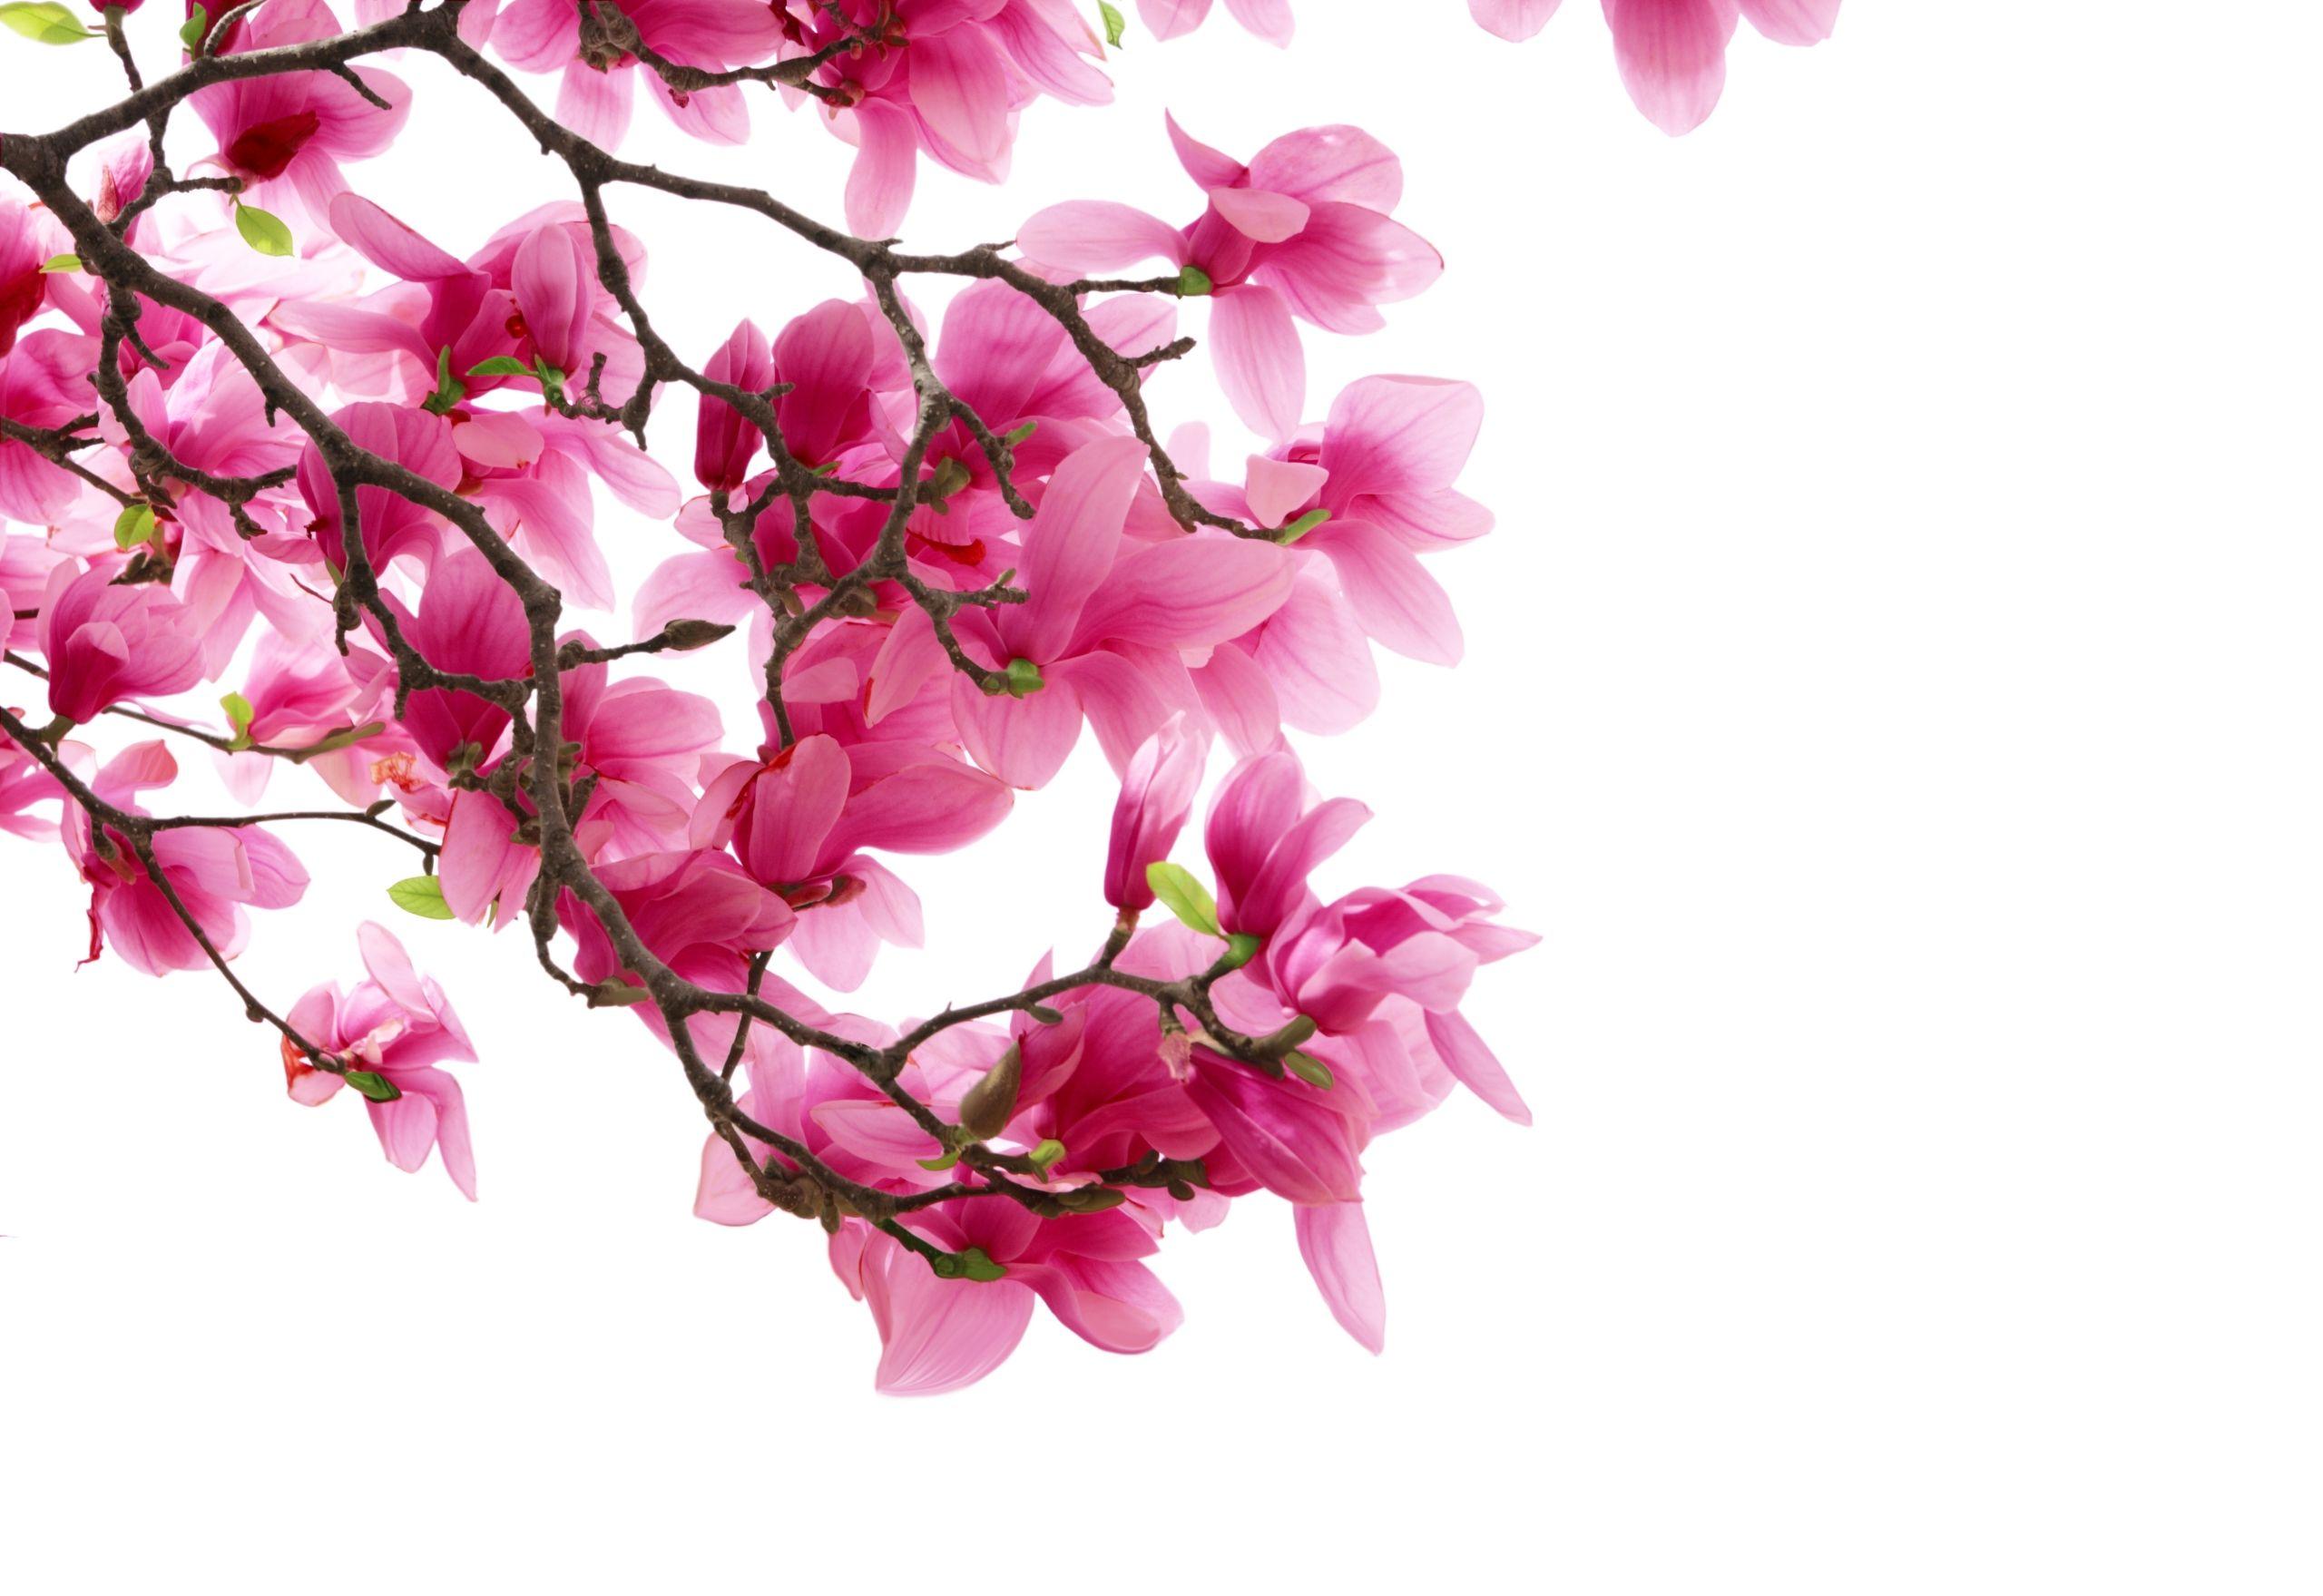 fond ecran hd fleur arbuste rose wallpaper pink flower desktop hr